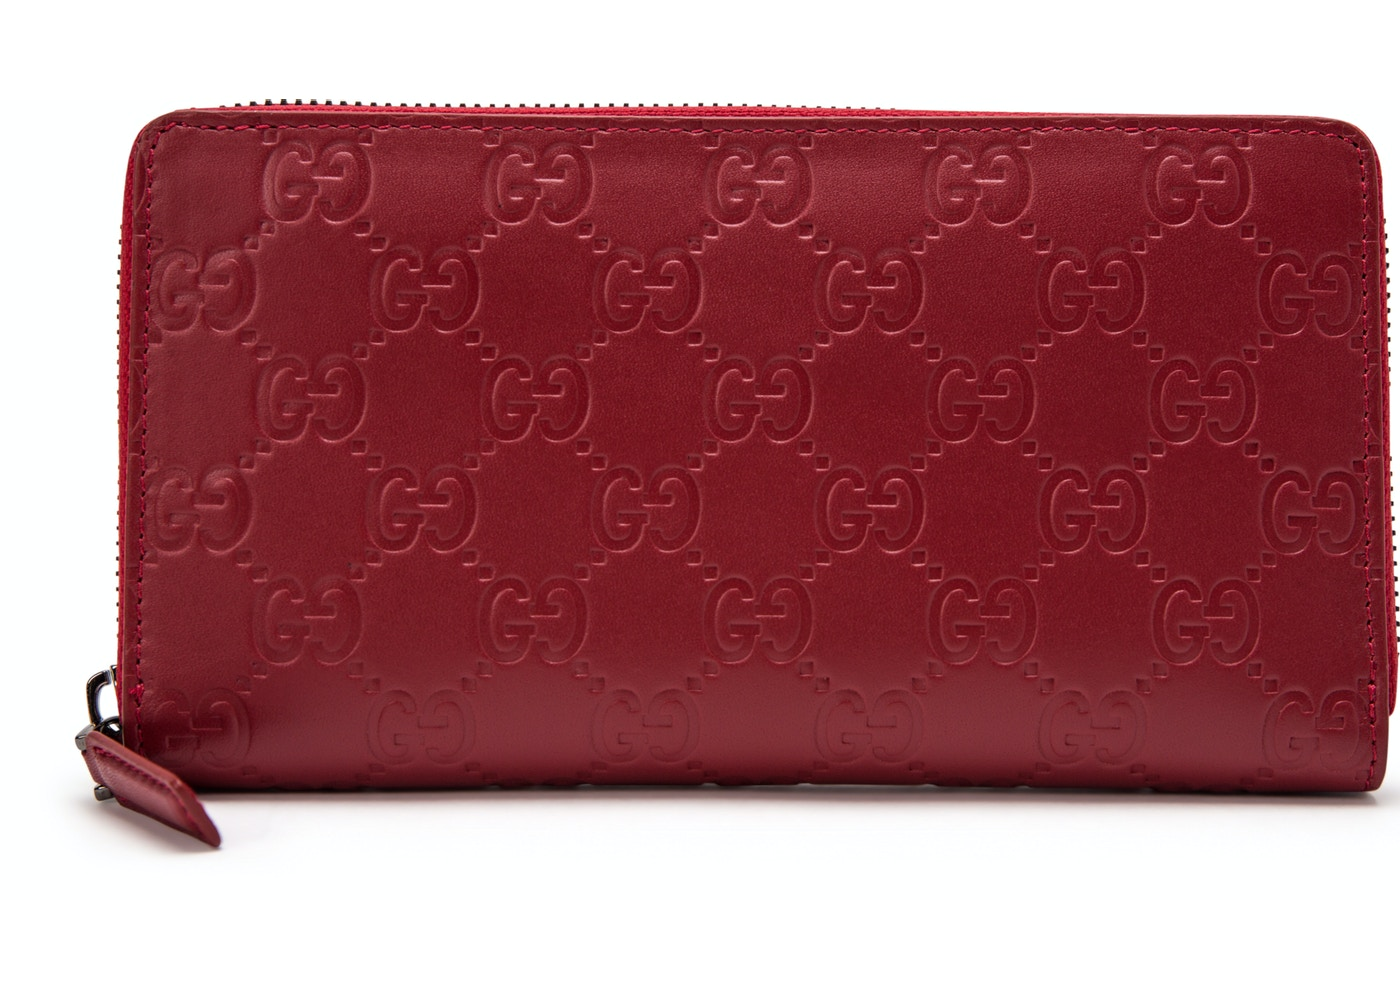 1e53ebc67572 Gucci Zip Around Wallet Signature Red. Signature Red